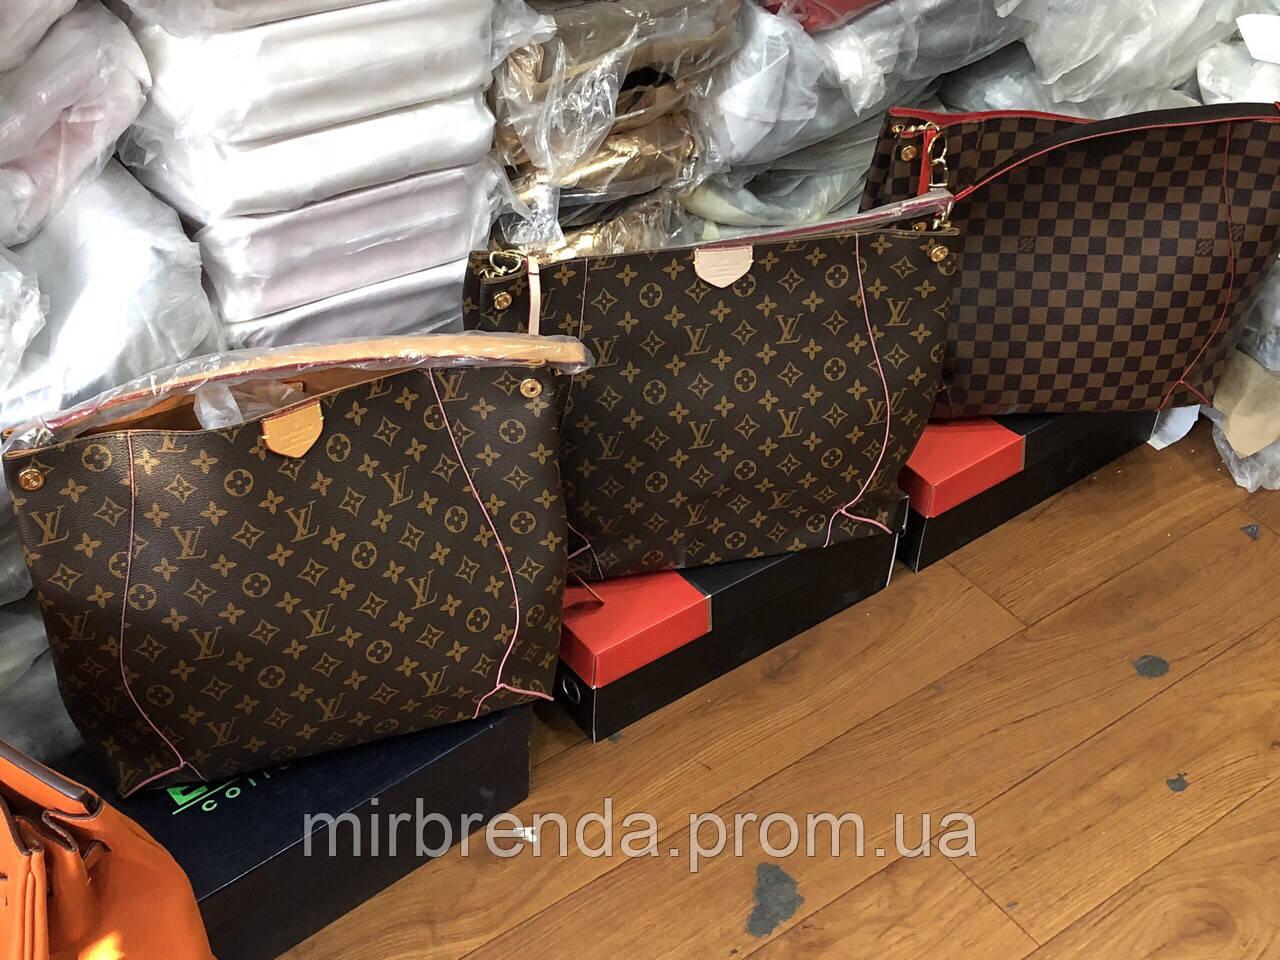 10ded6644c97 Сумки Louis Vuitton (Луи Вуиттон) в наличии  1 450 грн. - Сумки ...